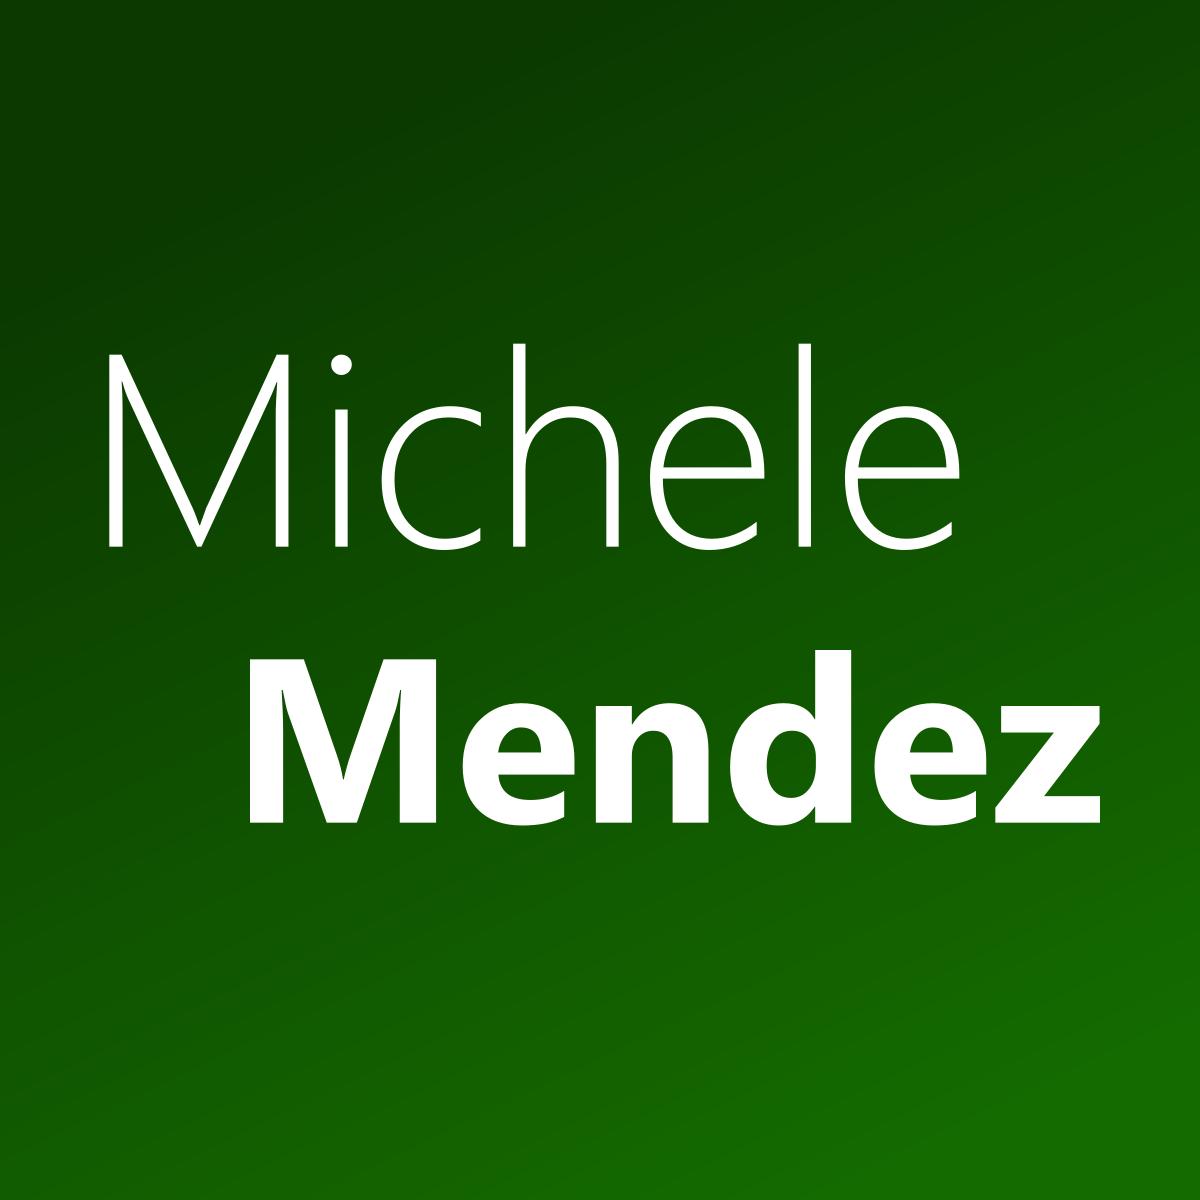 Michele Mendez